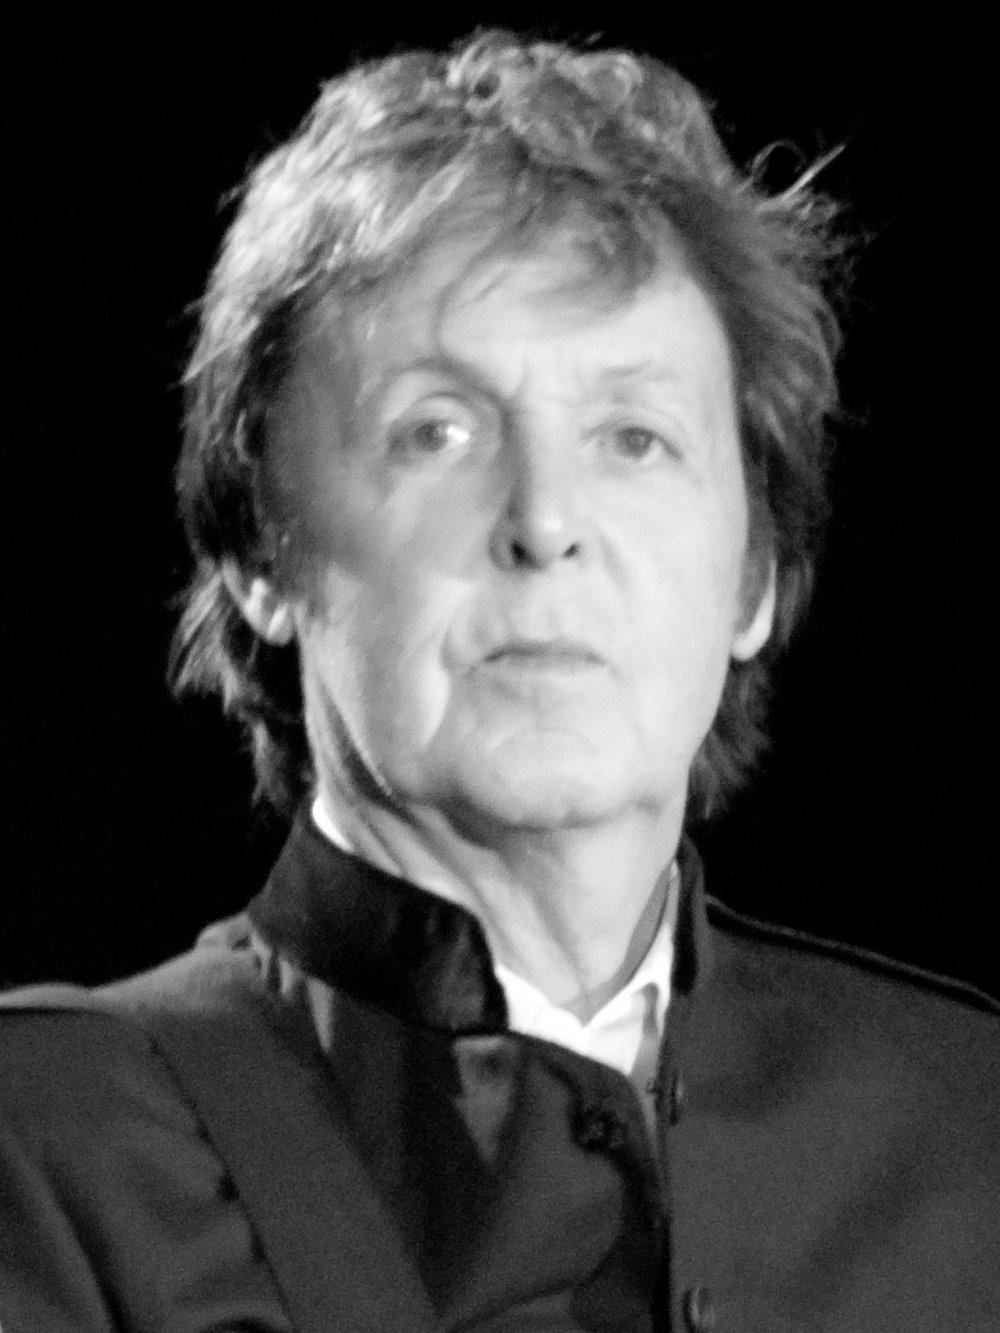 Paul_McCartney_black_and_white_2010_TFA.jpg